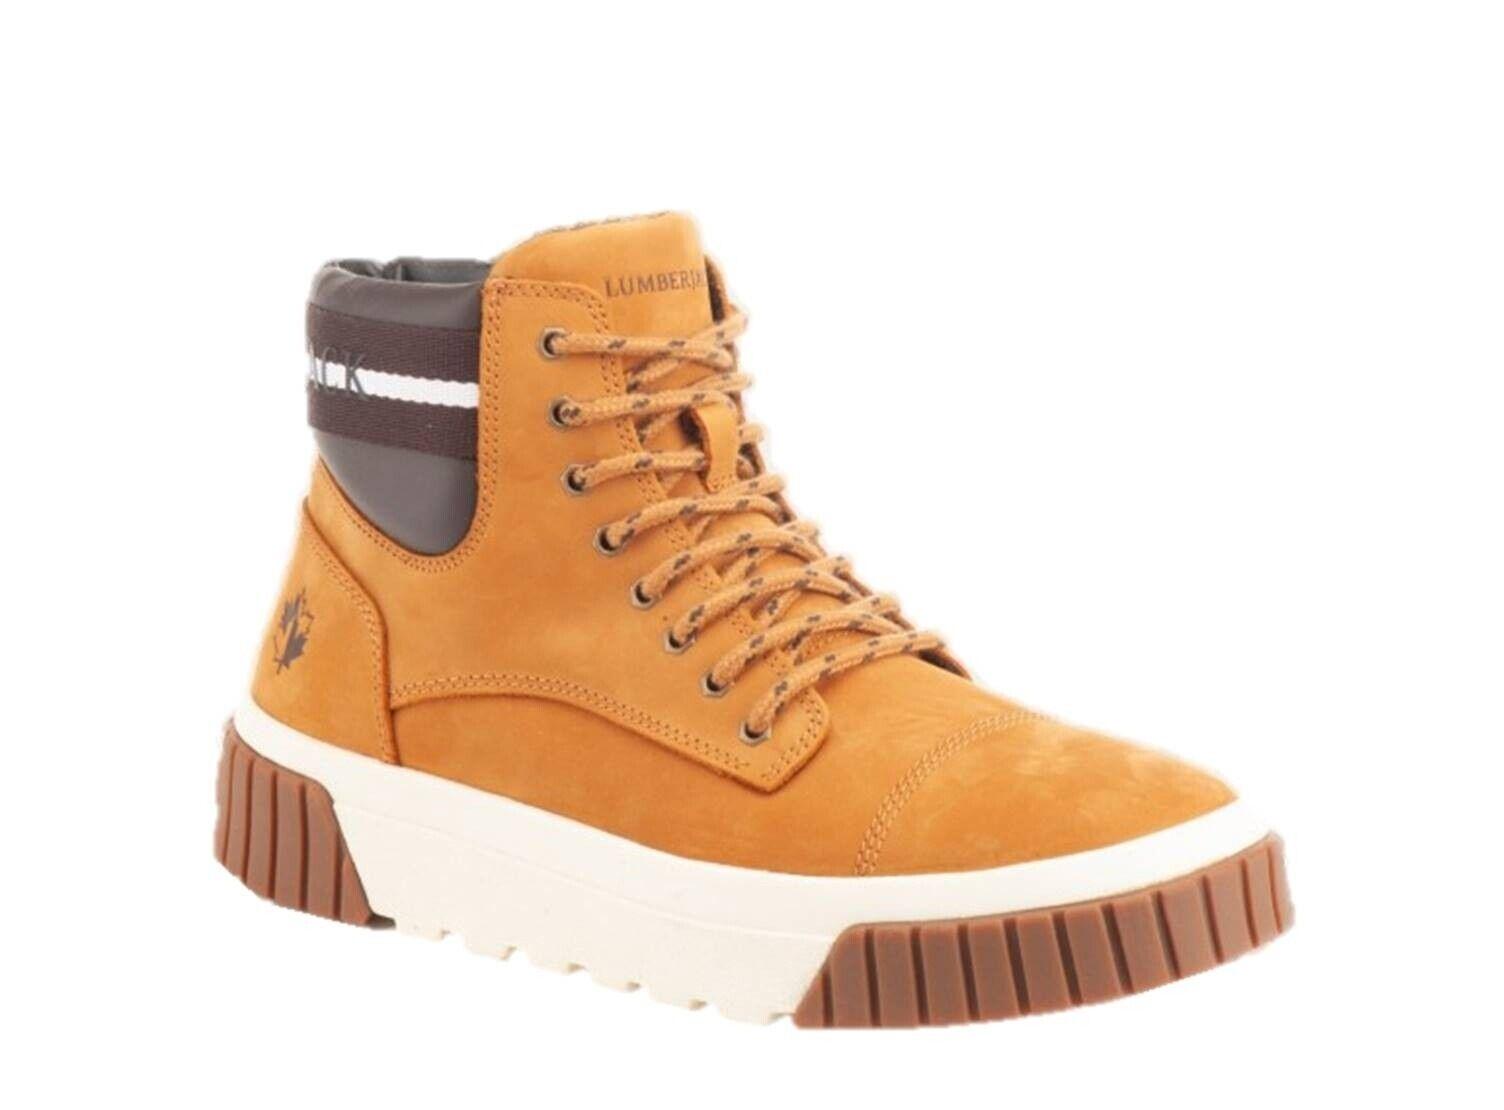 Lumberjack Moskow SM65912 Stiefel Stiefeletten Desert Stiefel Hohe Schuhe Leder